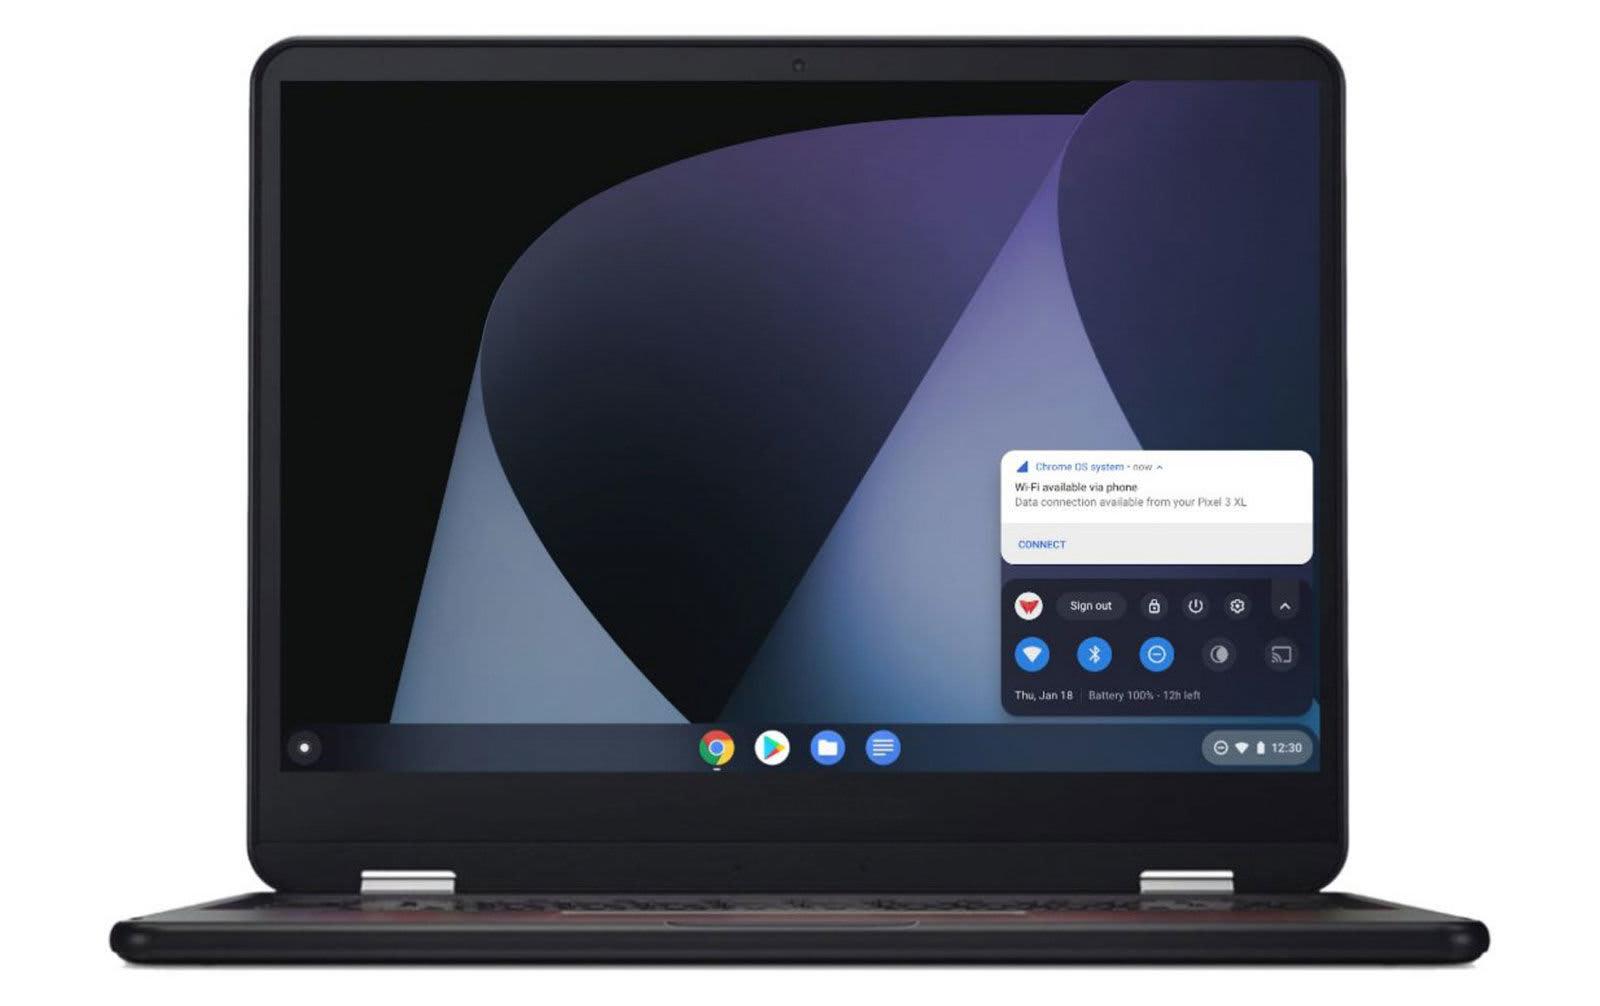 Chromebook instant tethering